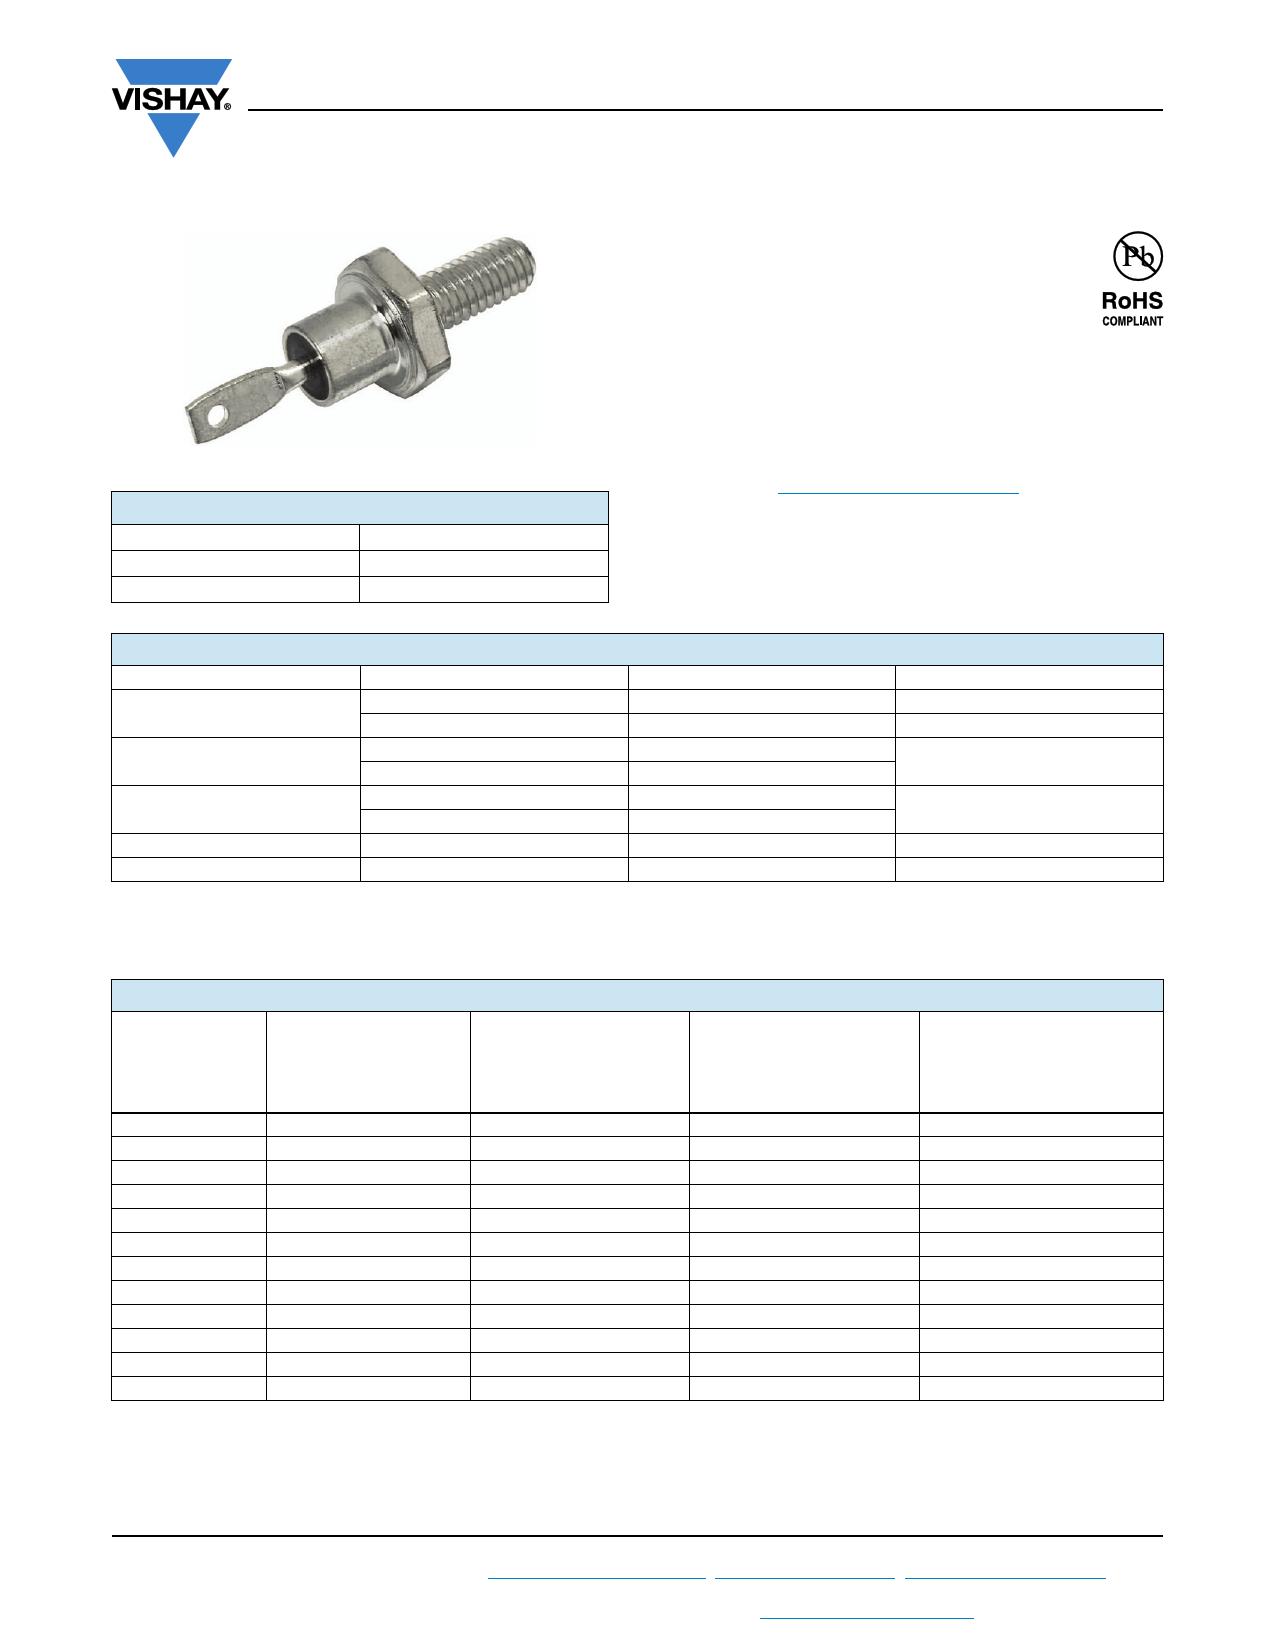 VS-1N1203A datasheet